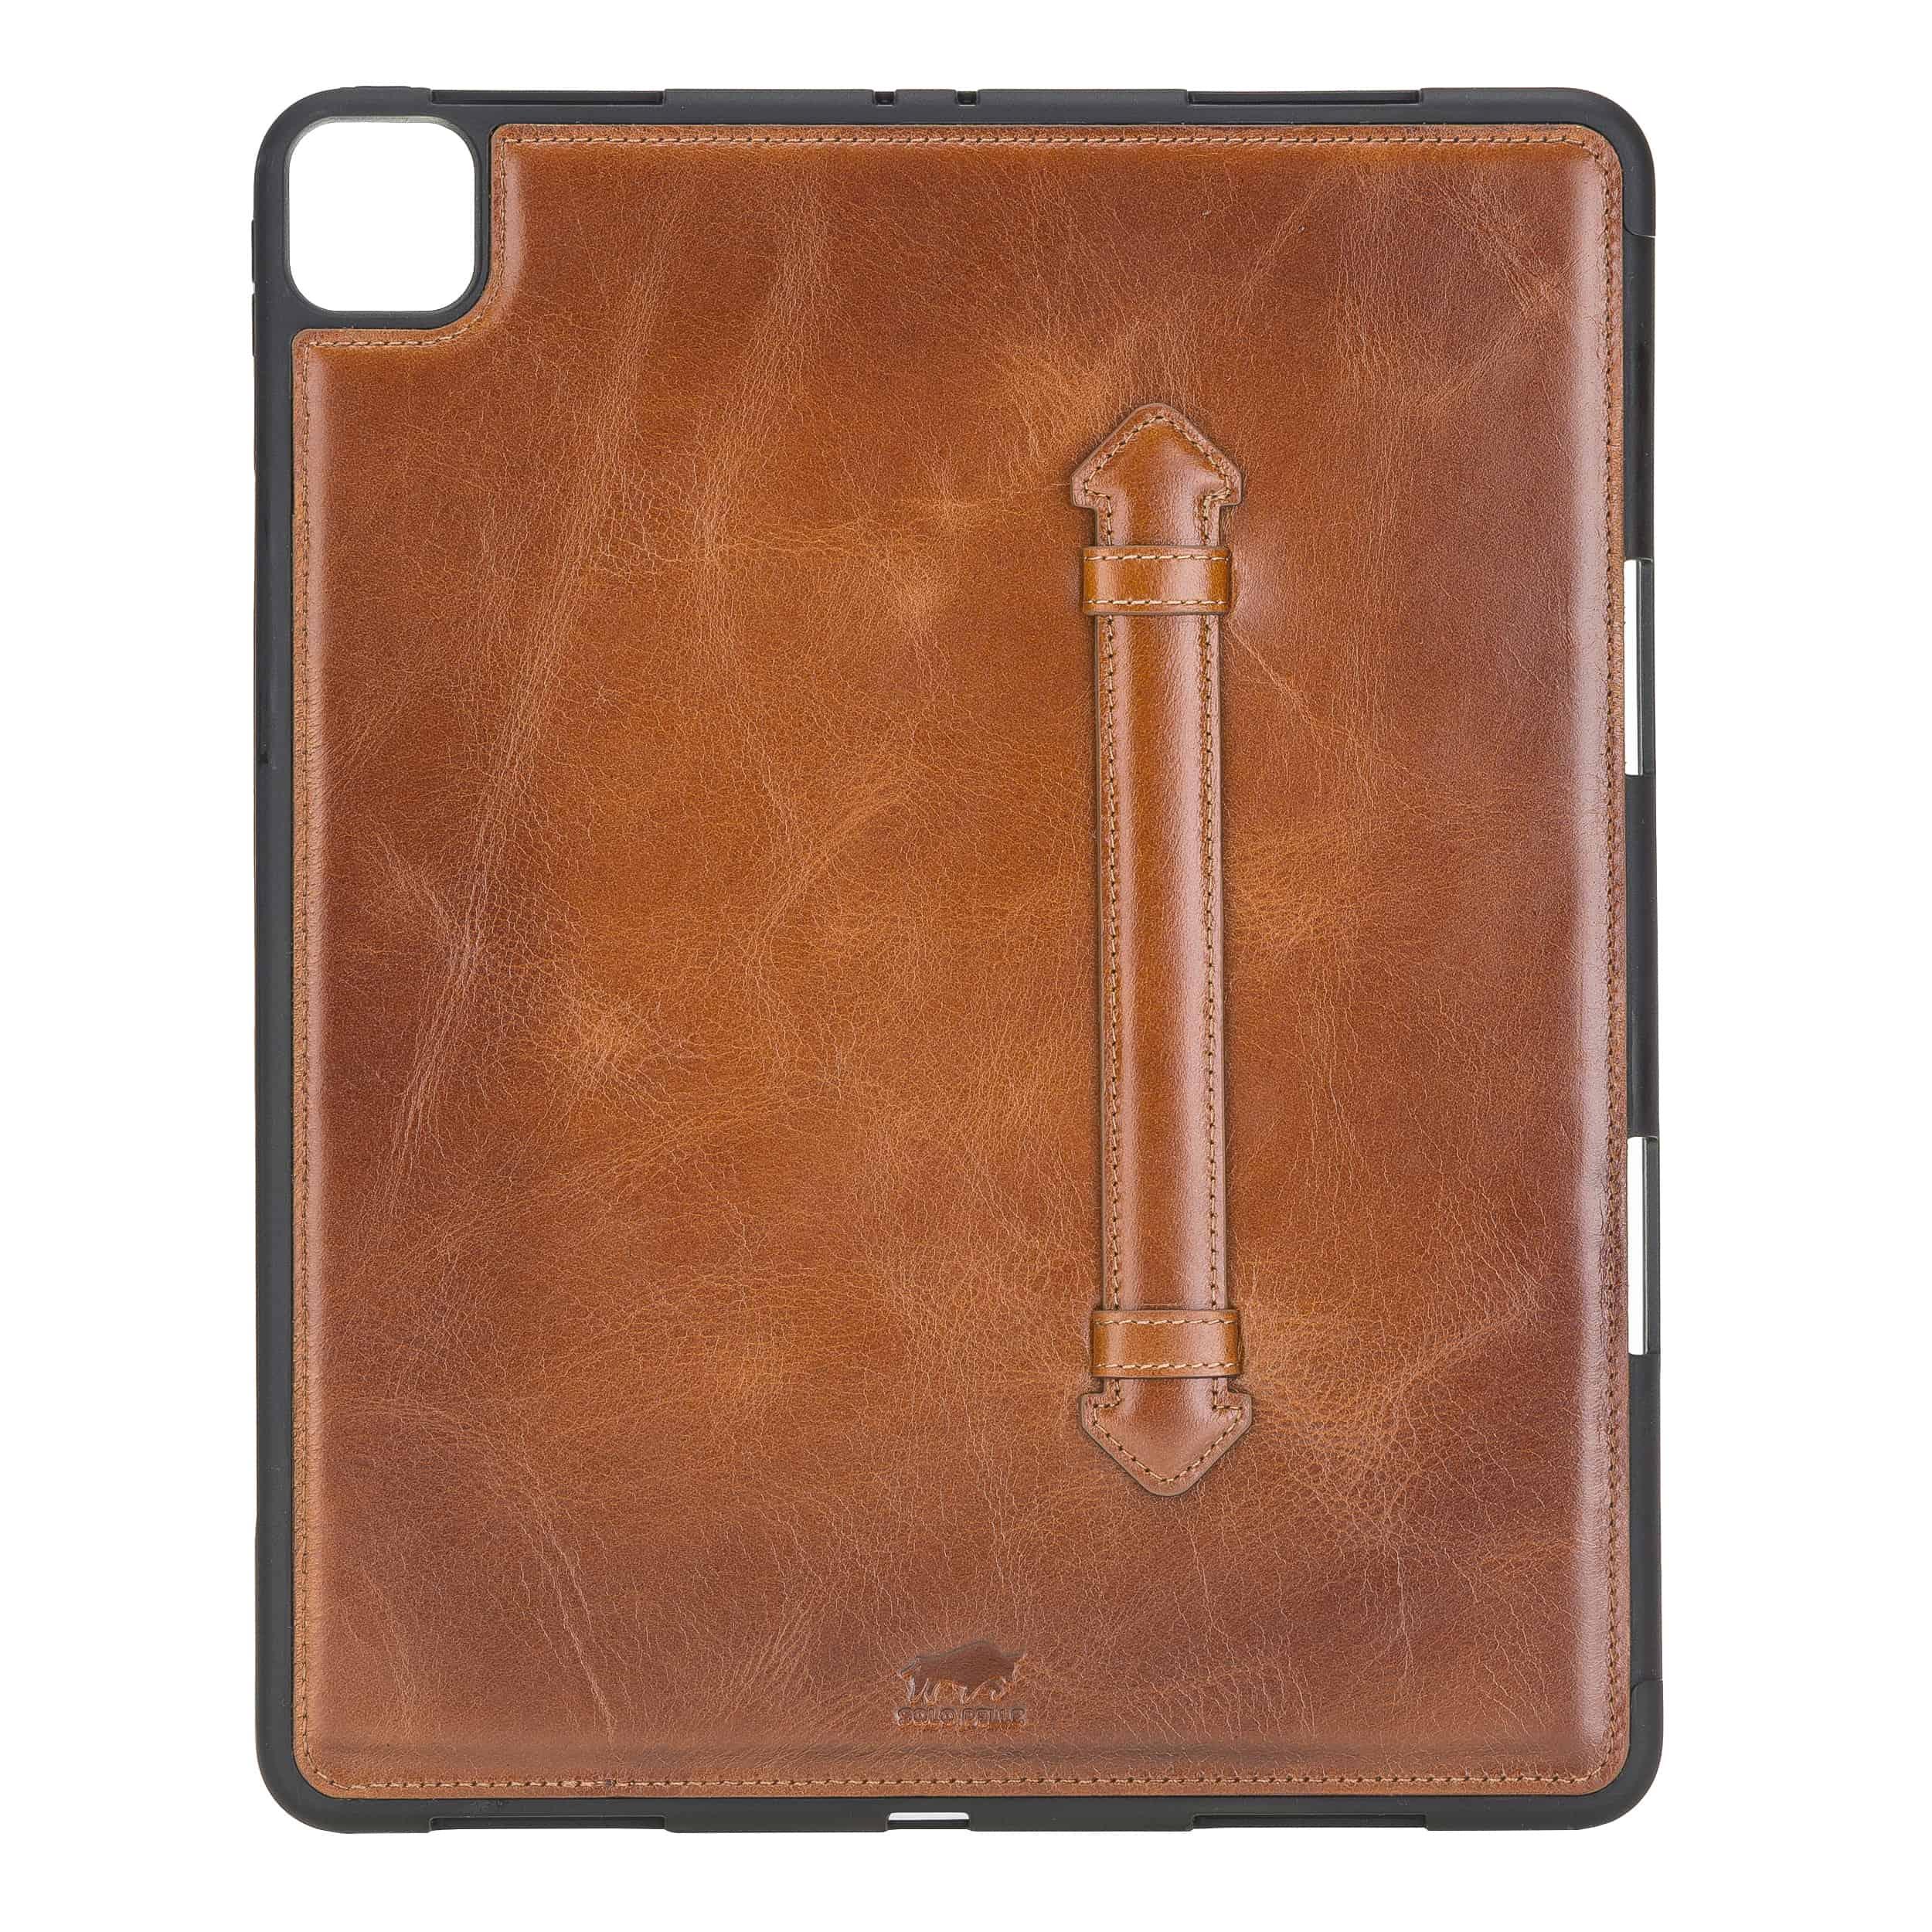 "Solo Pelle Hülle geeignet für Apple iPad Pro 12,9"" 2020 Echtleder Case aus echtem Leder. Unterstützt Pencil inkl. Ledergriff (Cognac Braun Effekt)"